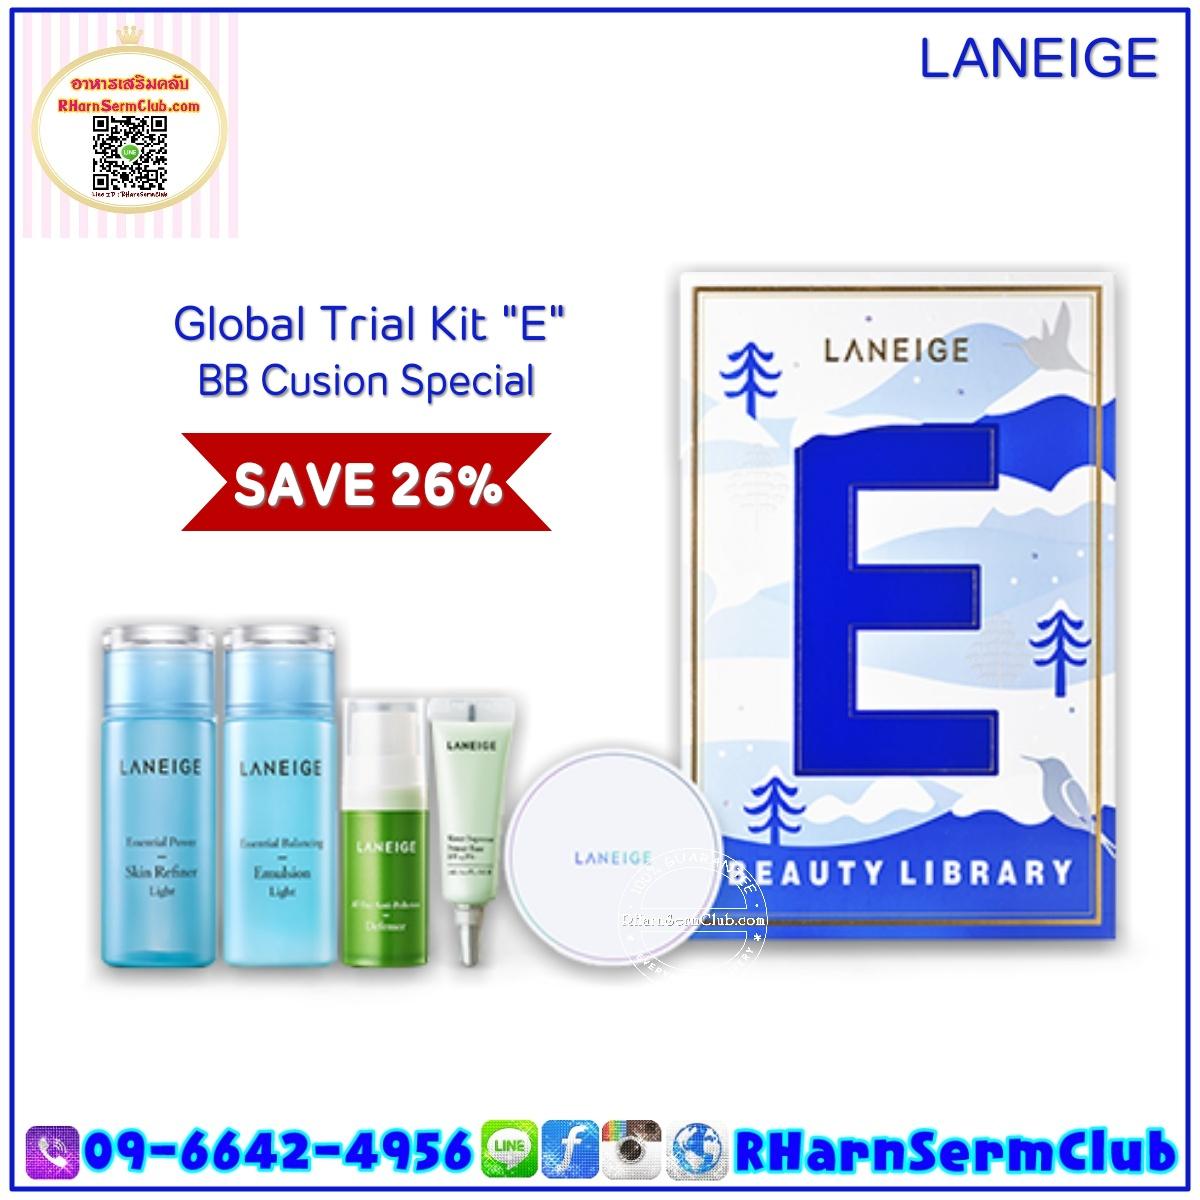 "LANEIGE Global Trial Kit ""E"" (BB Cushion Spcial)"